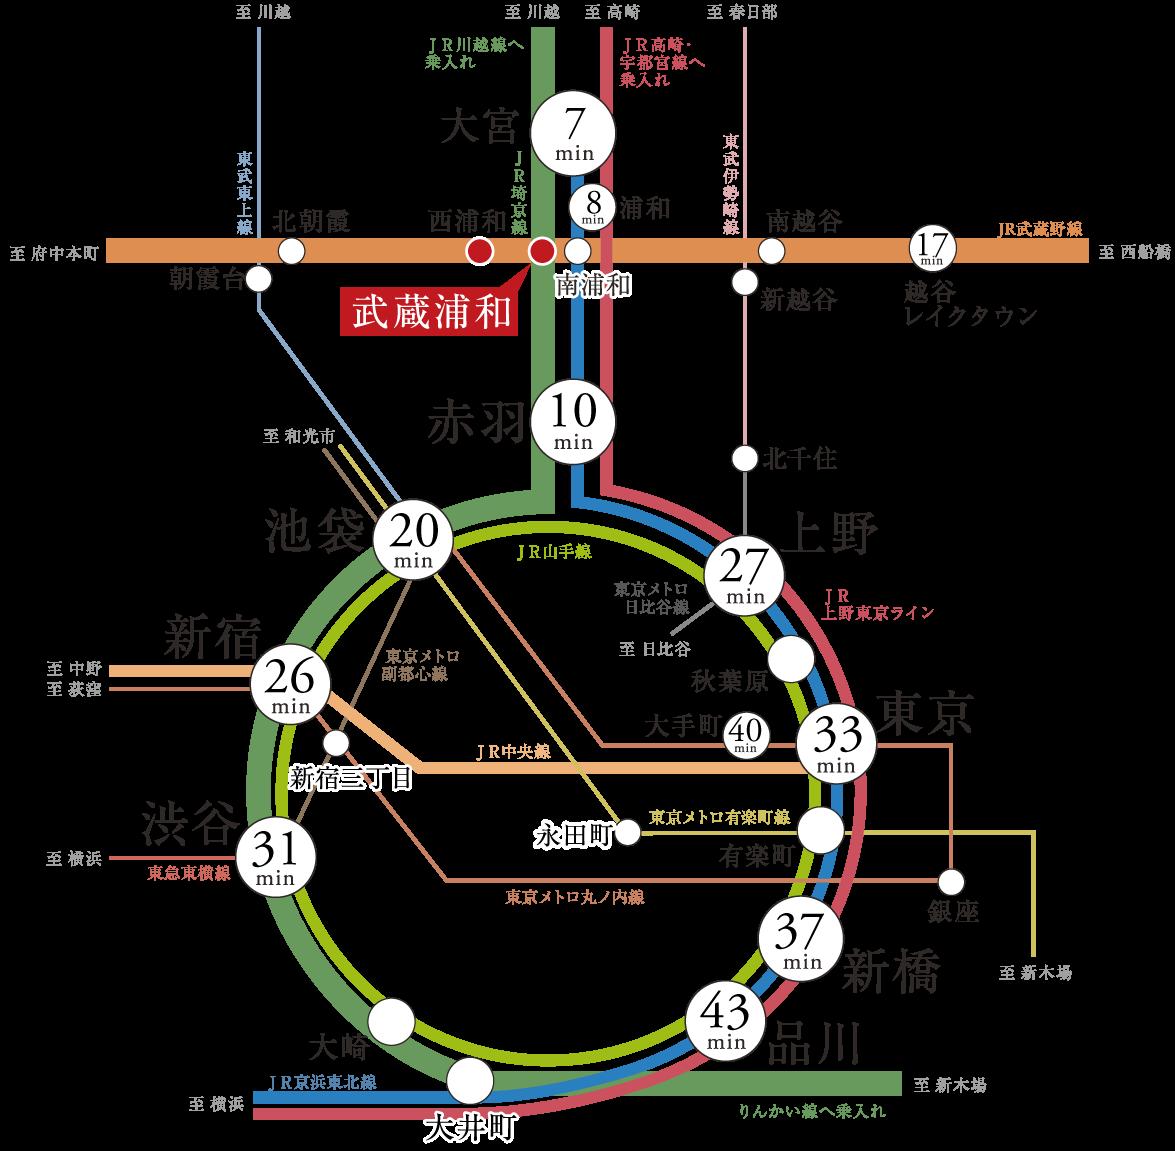 Japan Image 埼京線 路線図